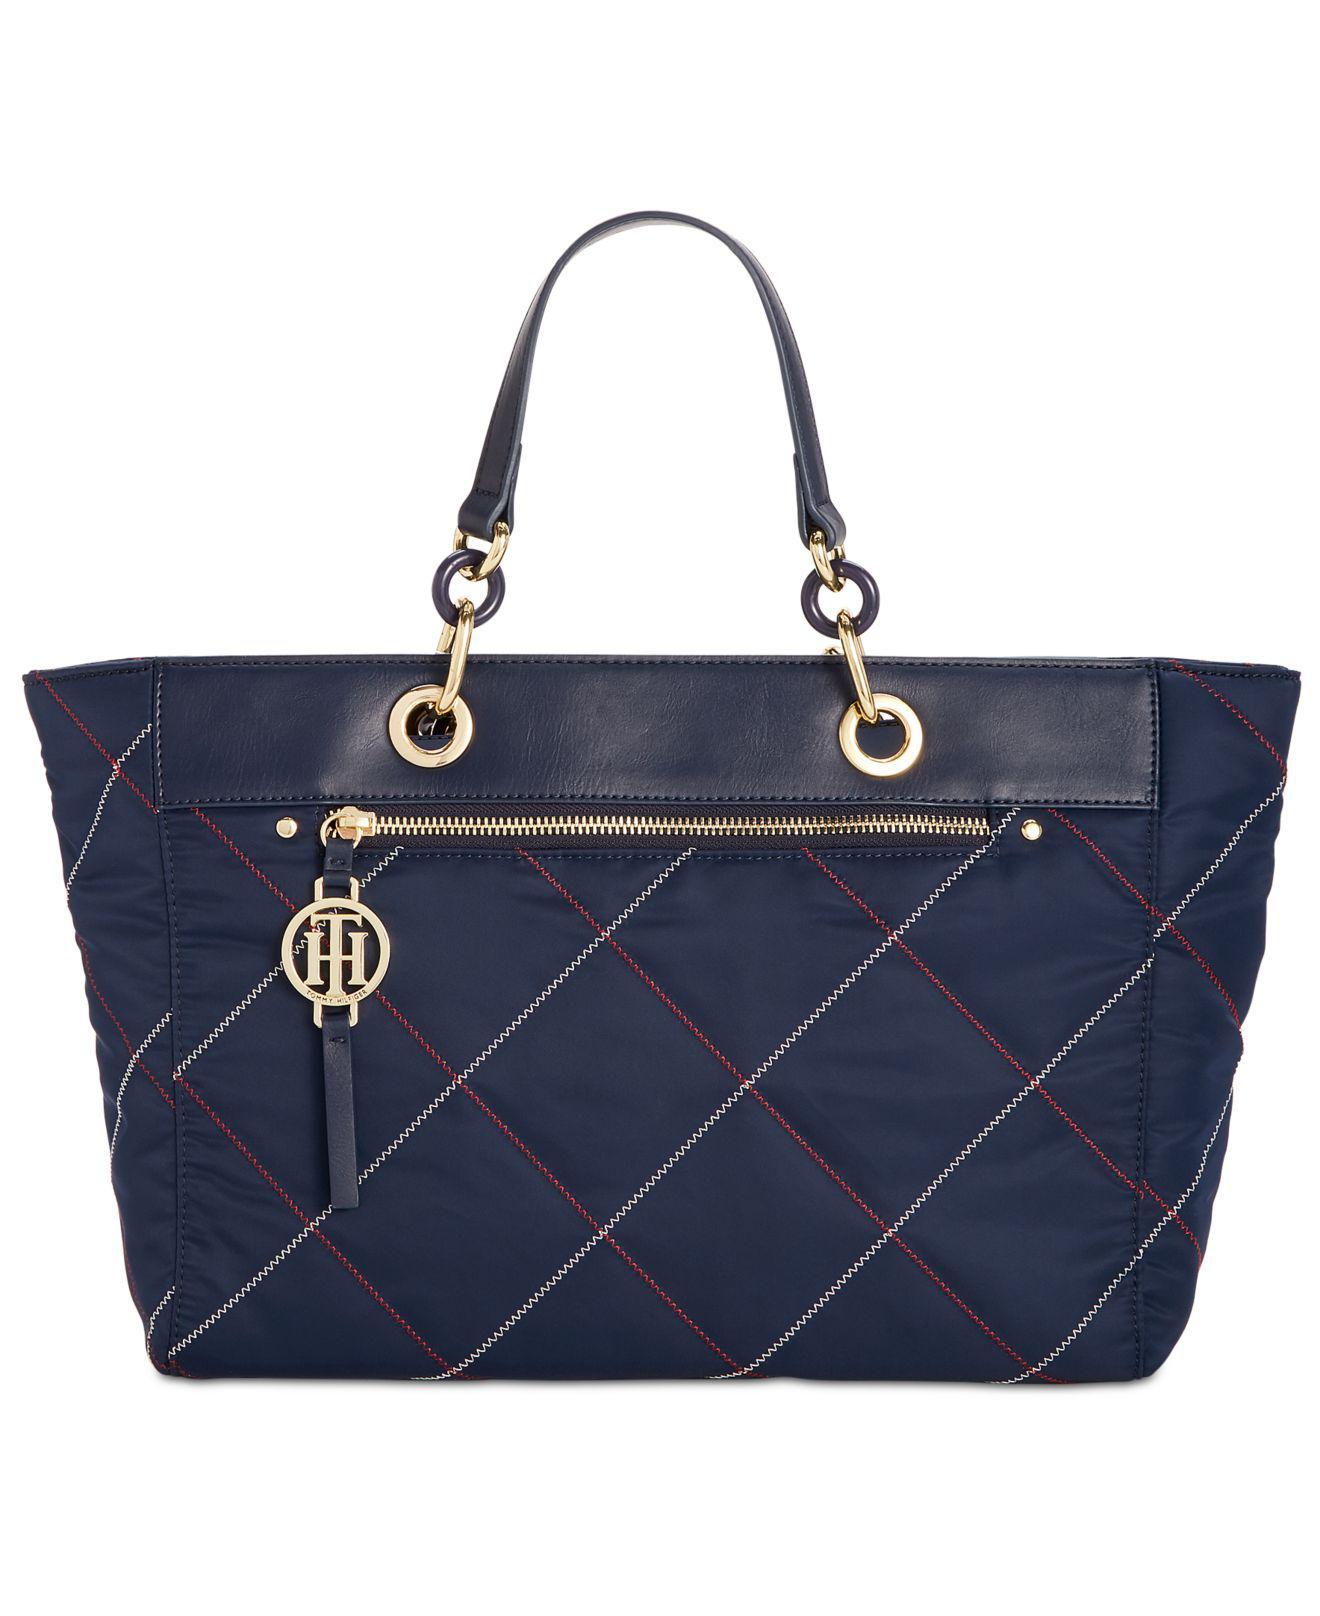 a6f05d4745a Lyst - Tommy Hilfiger Rosie Shopper in Blue